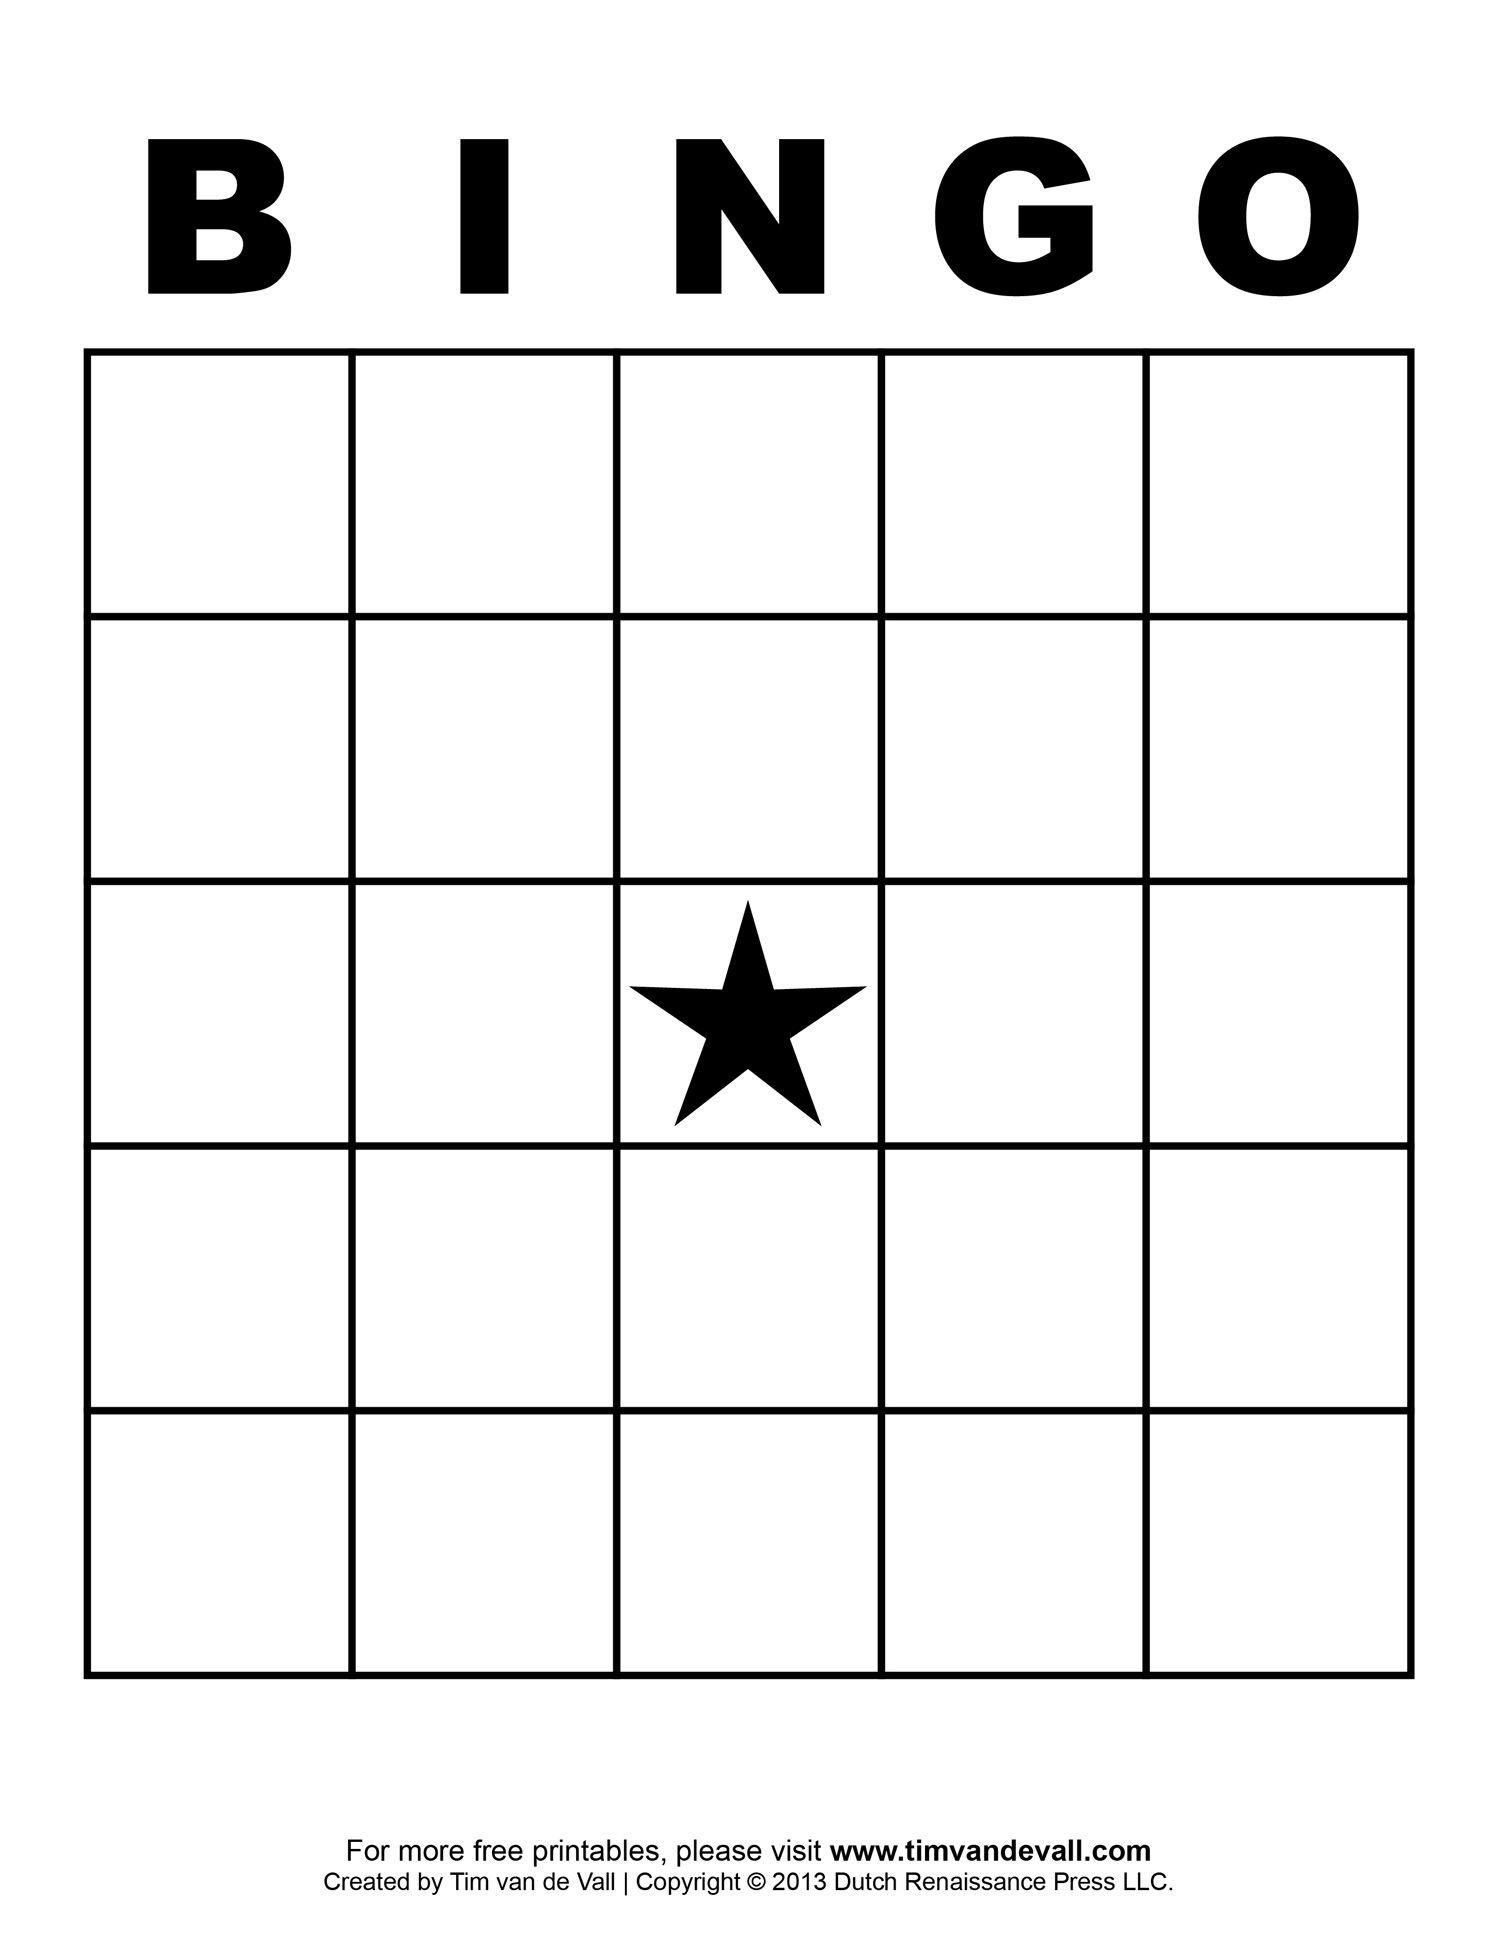 Free Printable Blank Bingo Cards Template 4 X 4 | Classroom | Blank - Free Bingo Patterns Printable